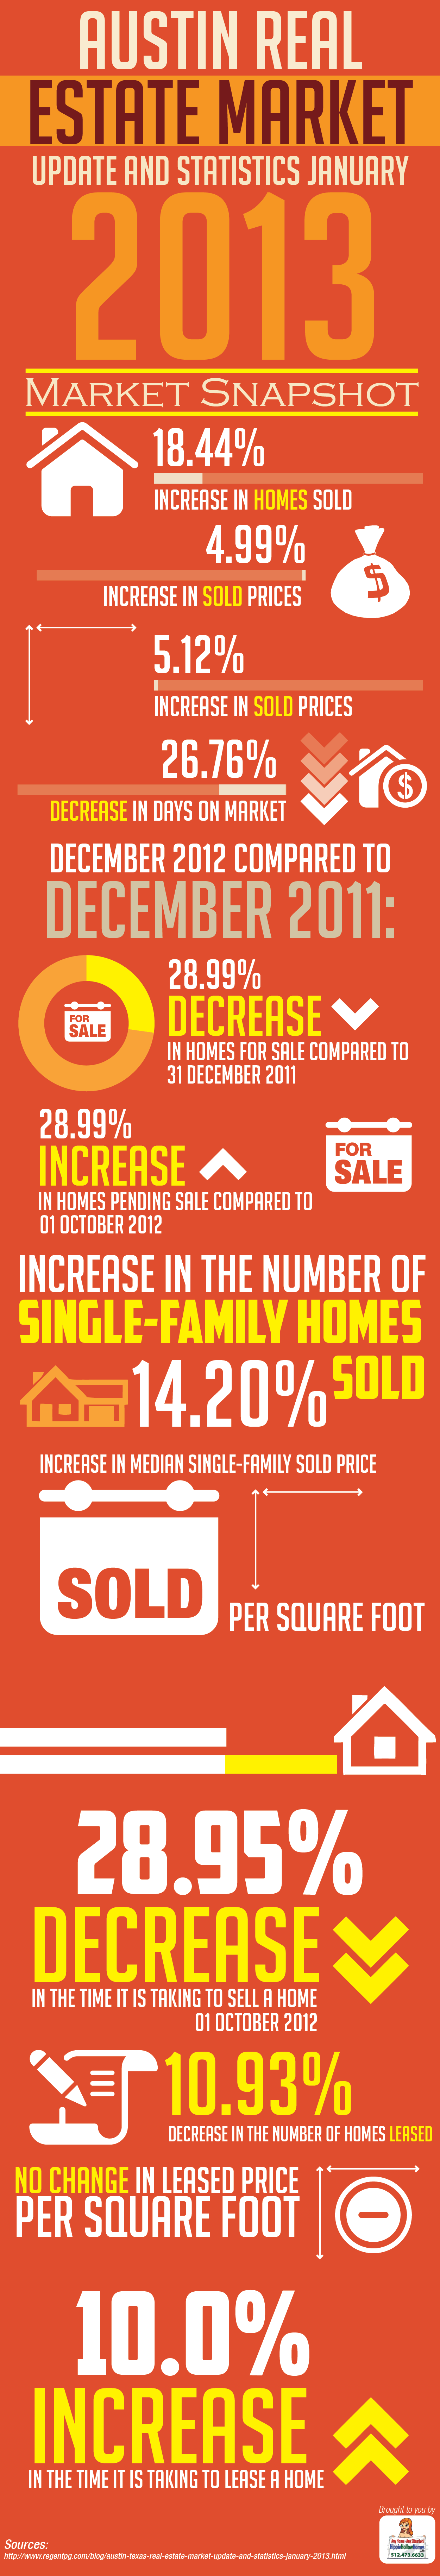 Austin-Real-Estate-Market-Update-Dec-2012